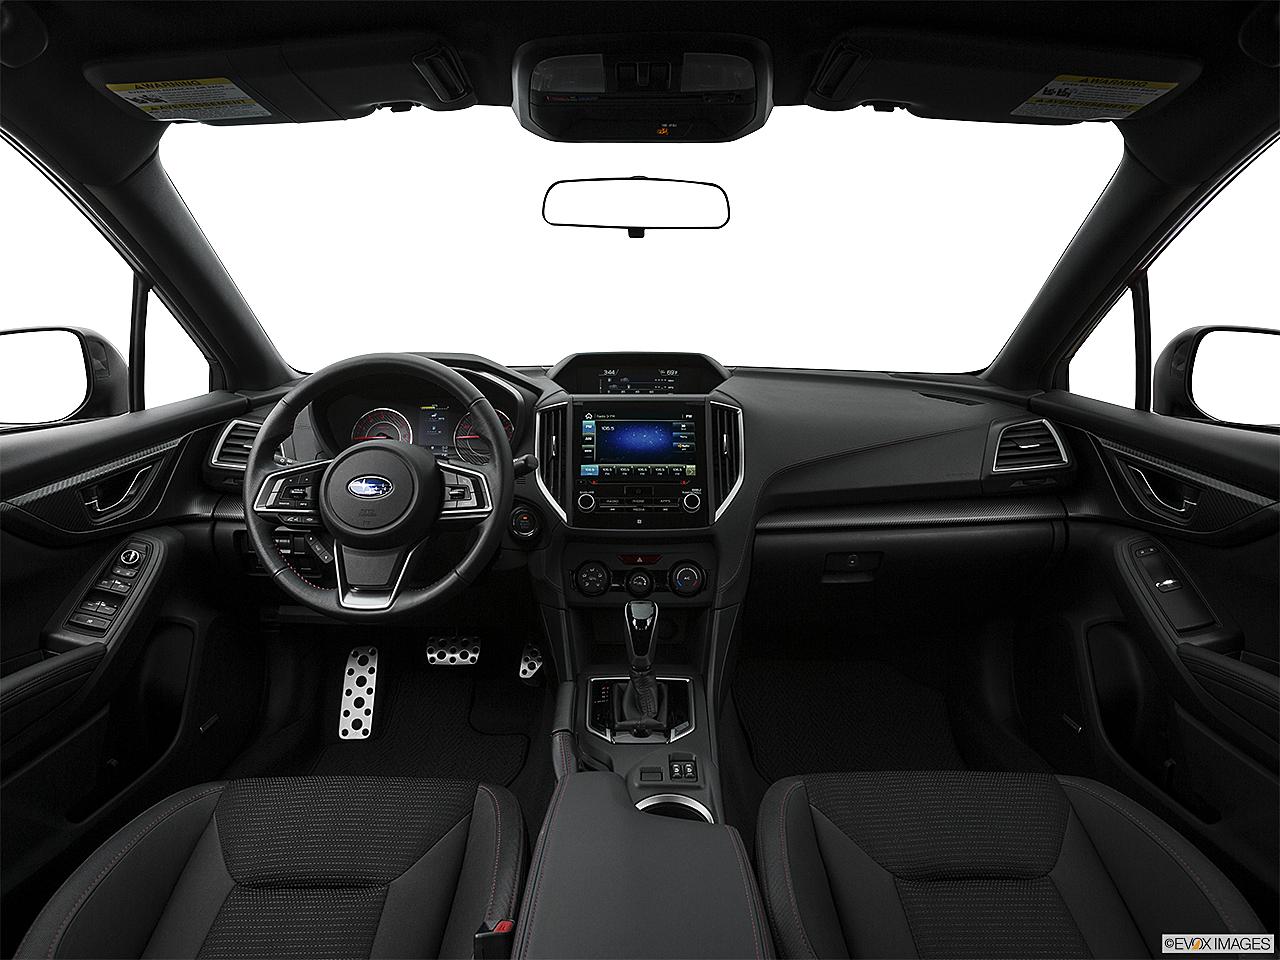 2017 subaru impreza awd sport 4dr sedan cvt research groovecar. Black Bedroom Furniture Sets. Home Design Ideas